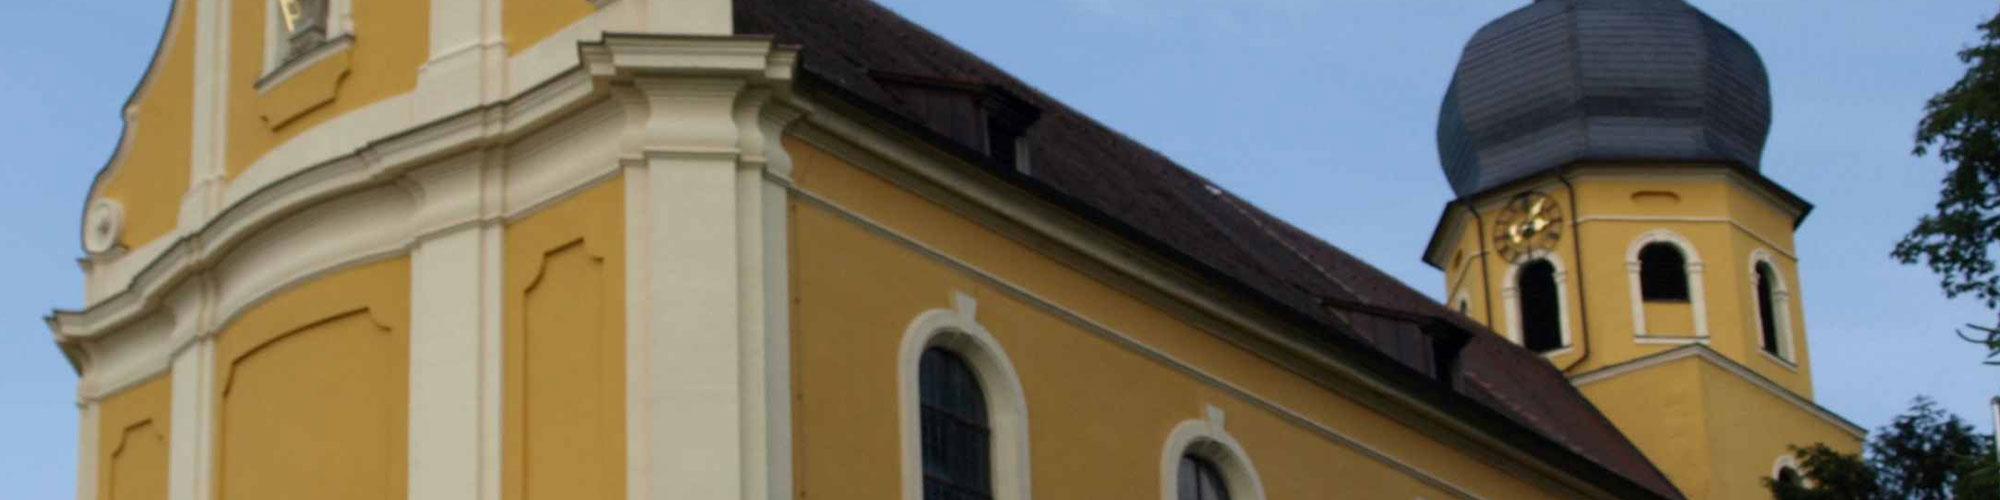 obereuerheim_slider